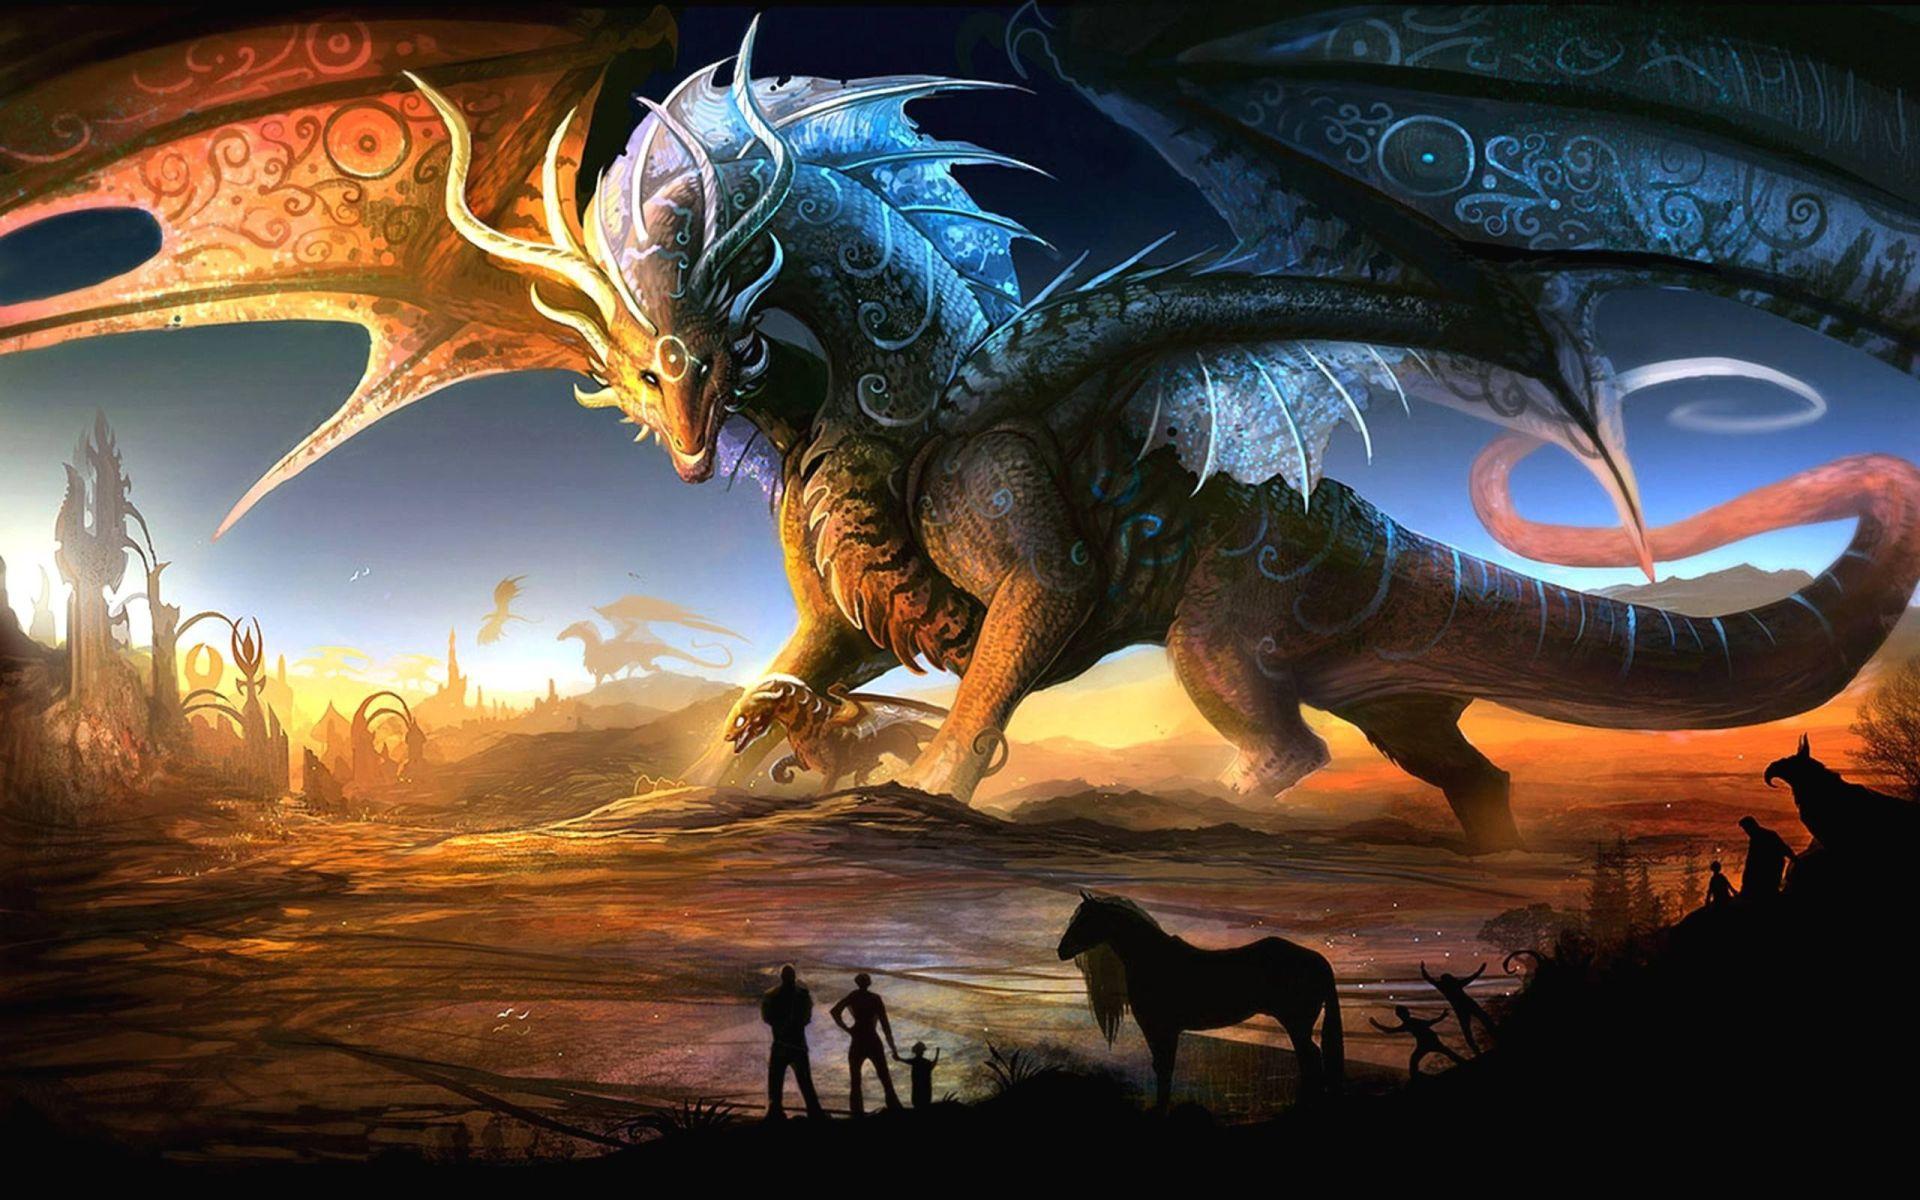 dragon hd wallpaper for p